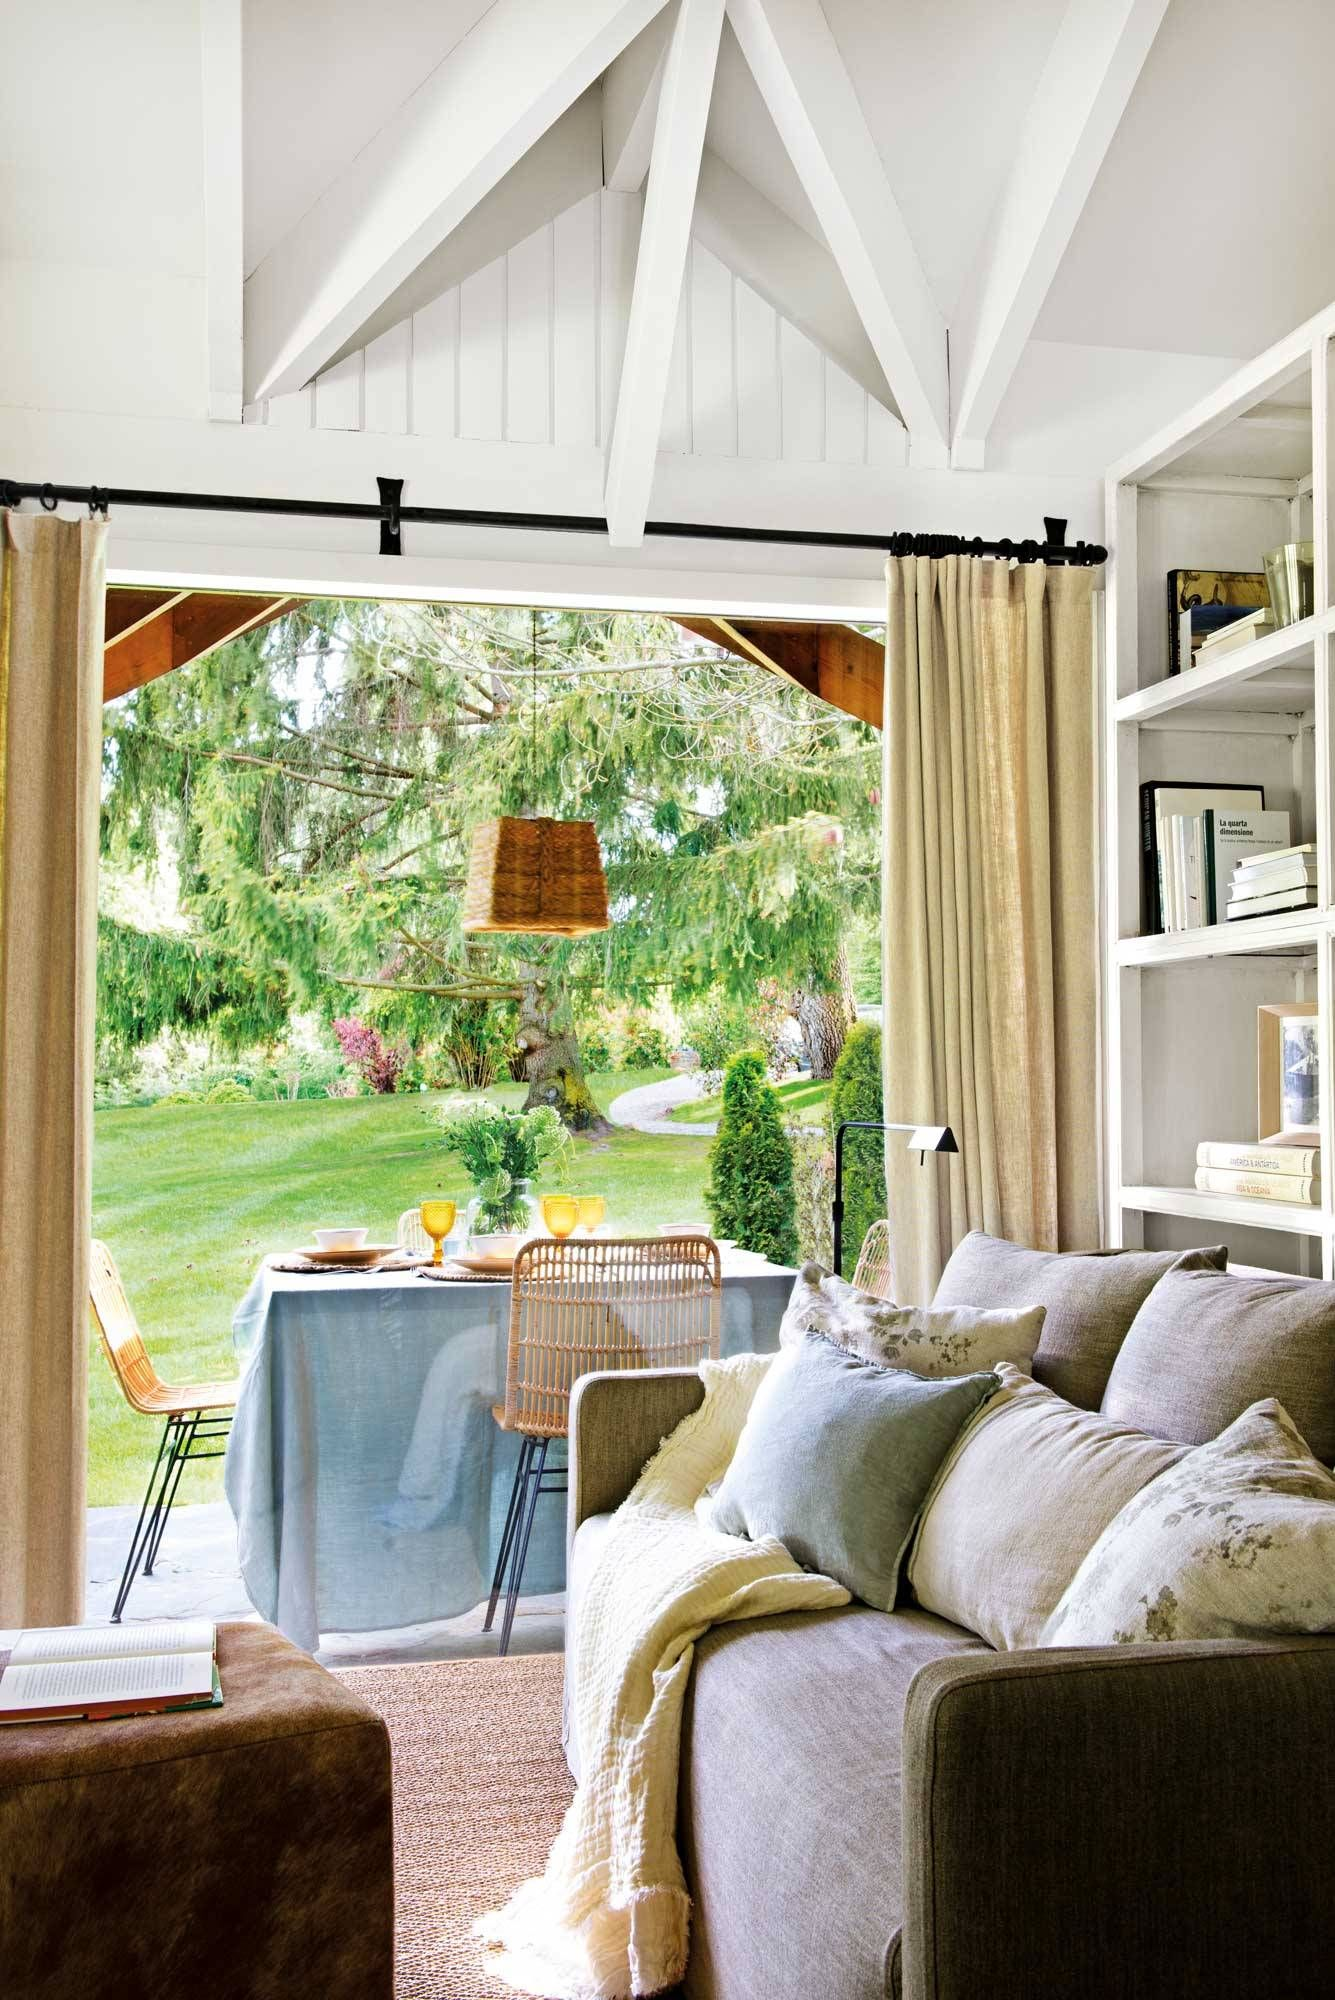 Interiores a medida con mucha madera Porches de casas